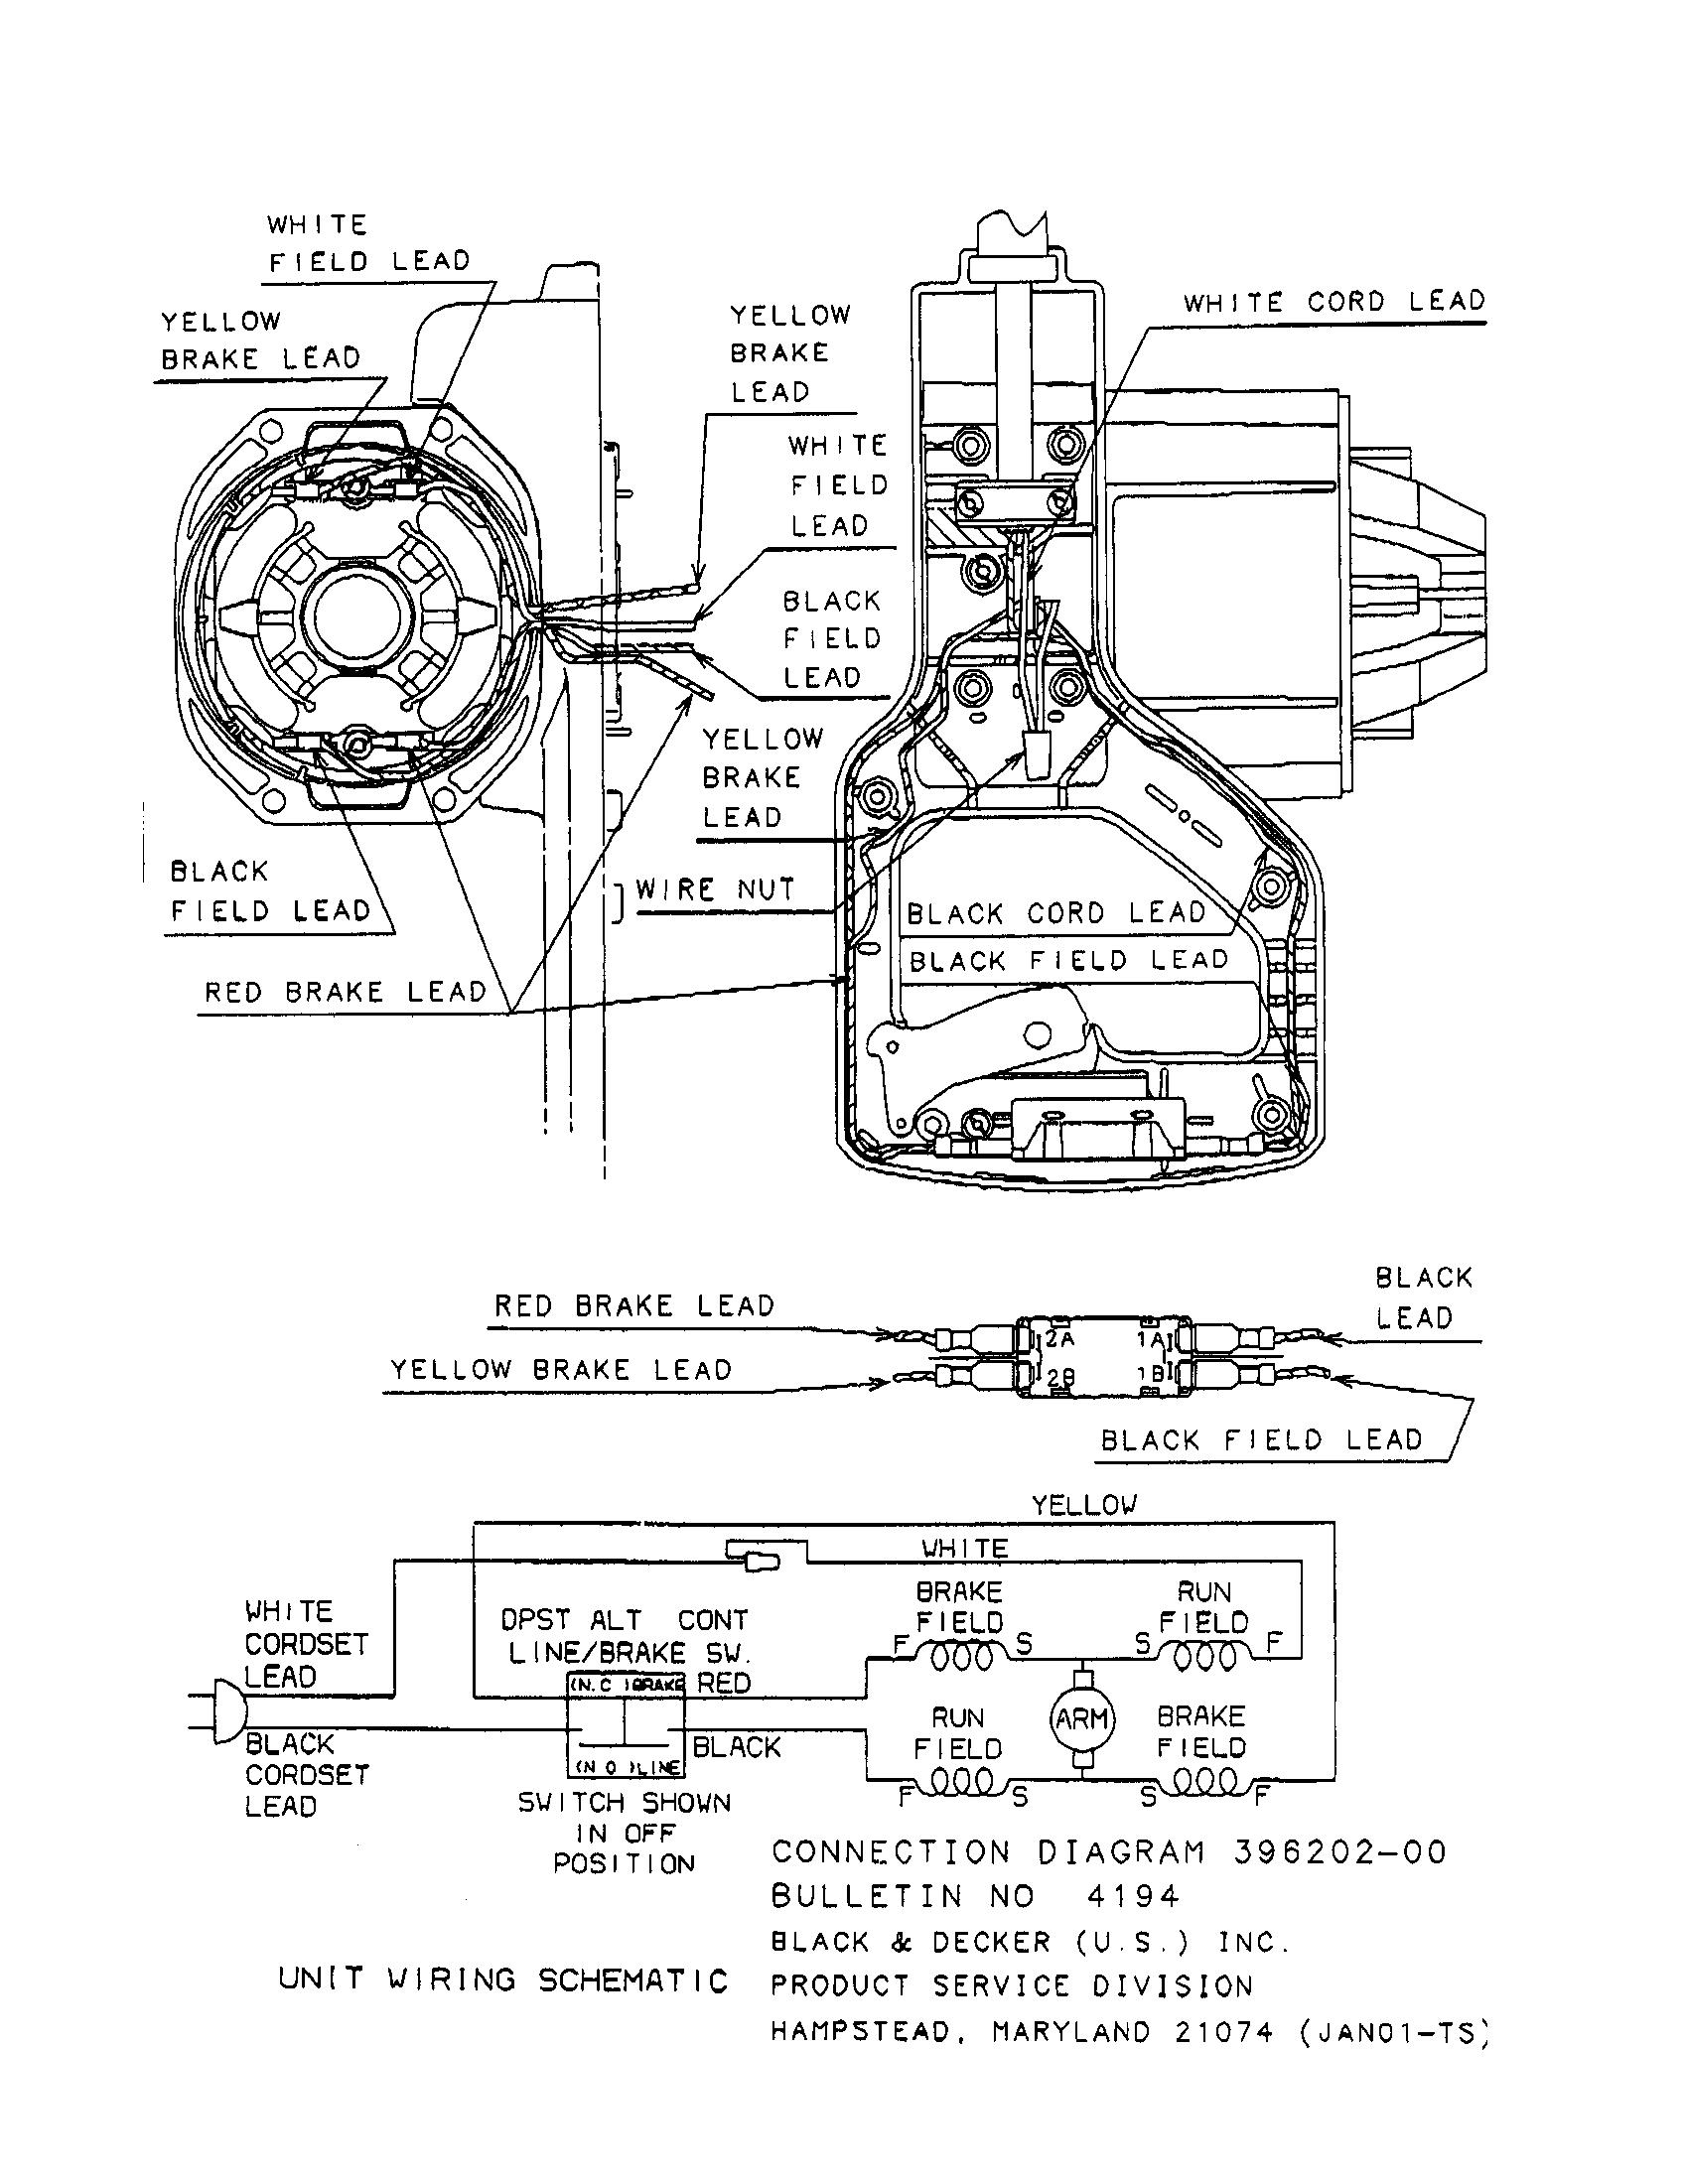 hight resolution of wiring diagram dw705 type 8 wiring diagram sheetwiring diagram dewalt dw705 wiring diagrams posts dw705 wiring